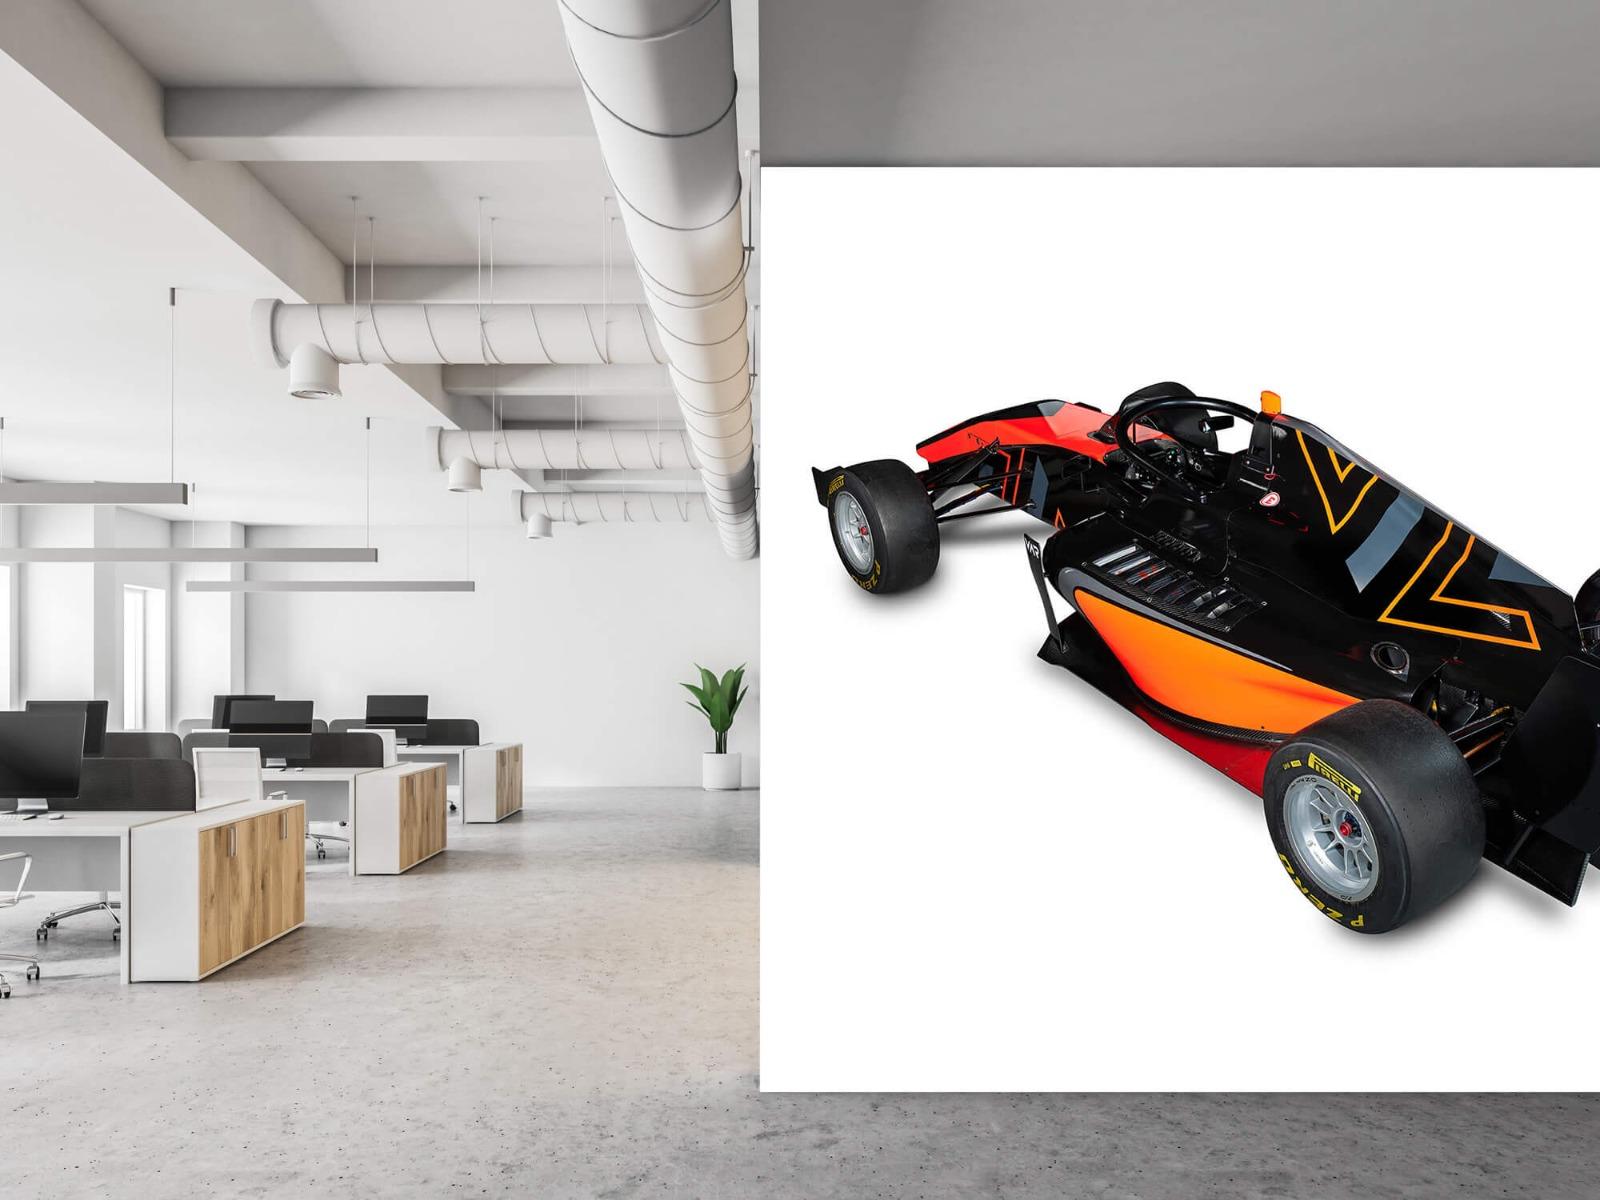 Sportauto's - Formula 3 - Rear left view - Hobbykamer 21